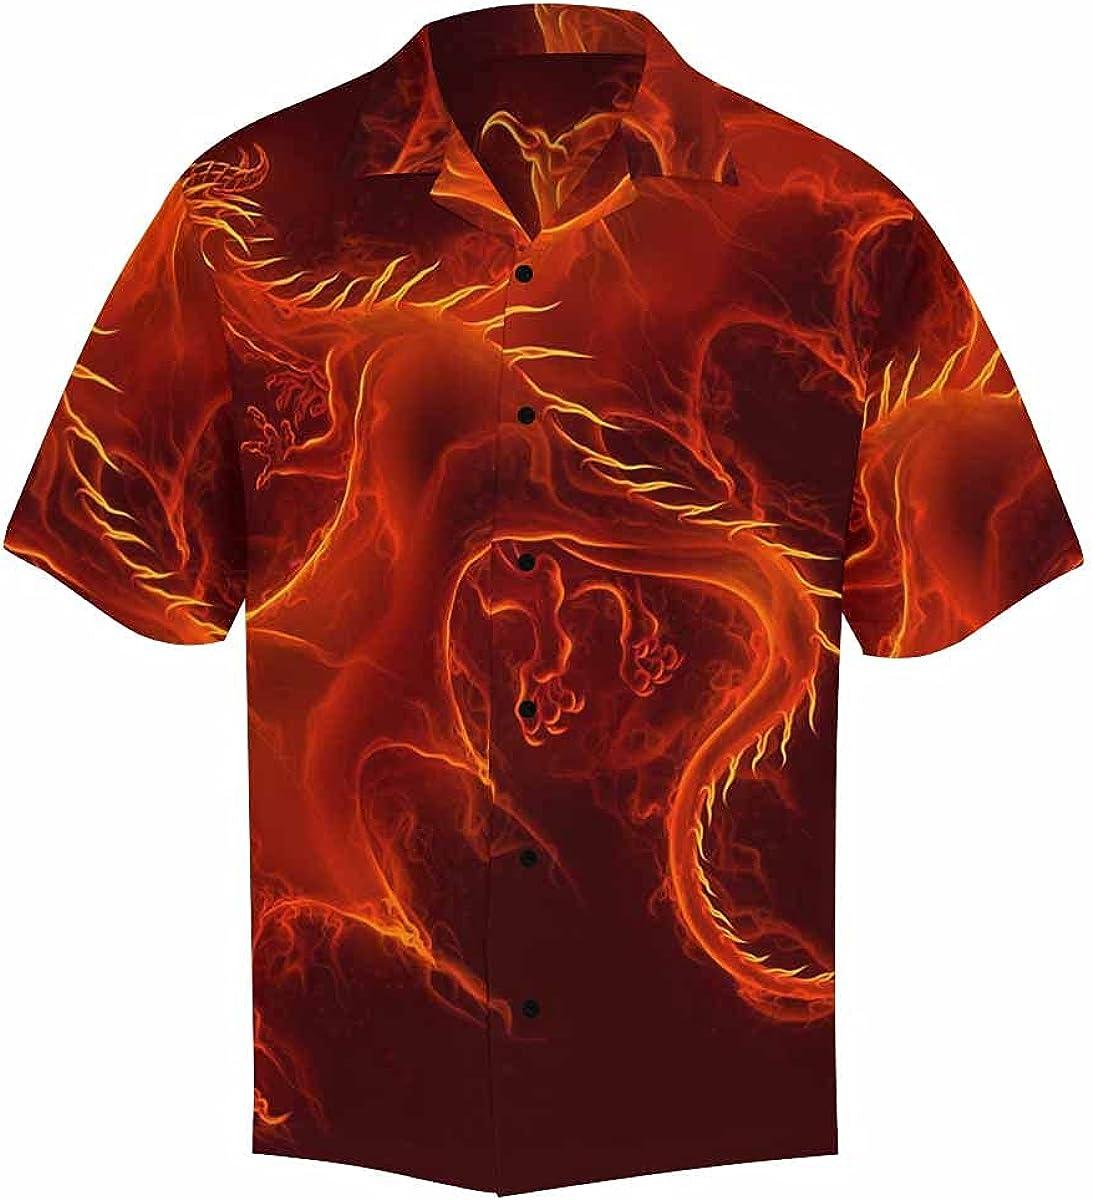 InterestPrint Men's Casual Button Down Short Sleeve Fantasy Scene Dragon Hawaiian Shirt (S-5XL)